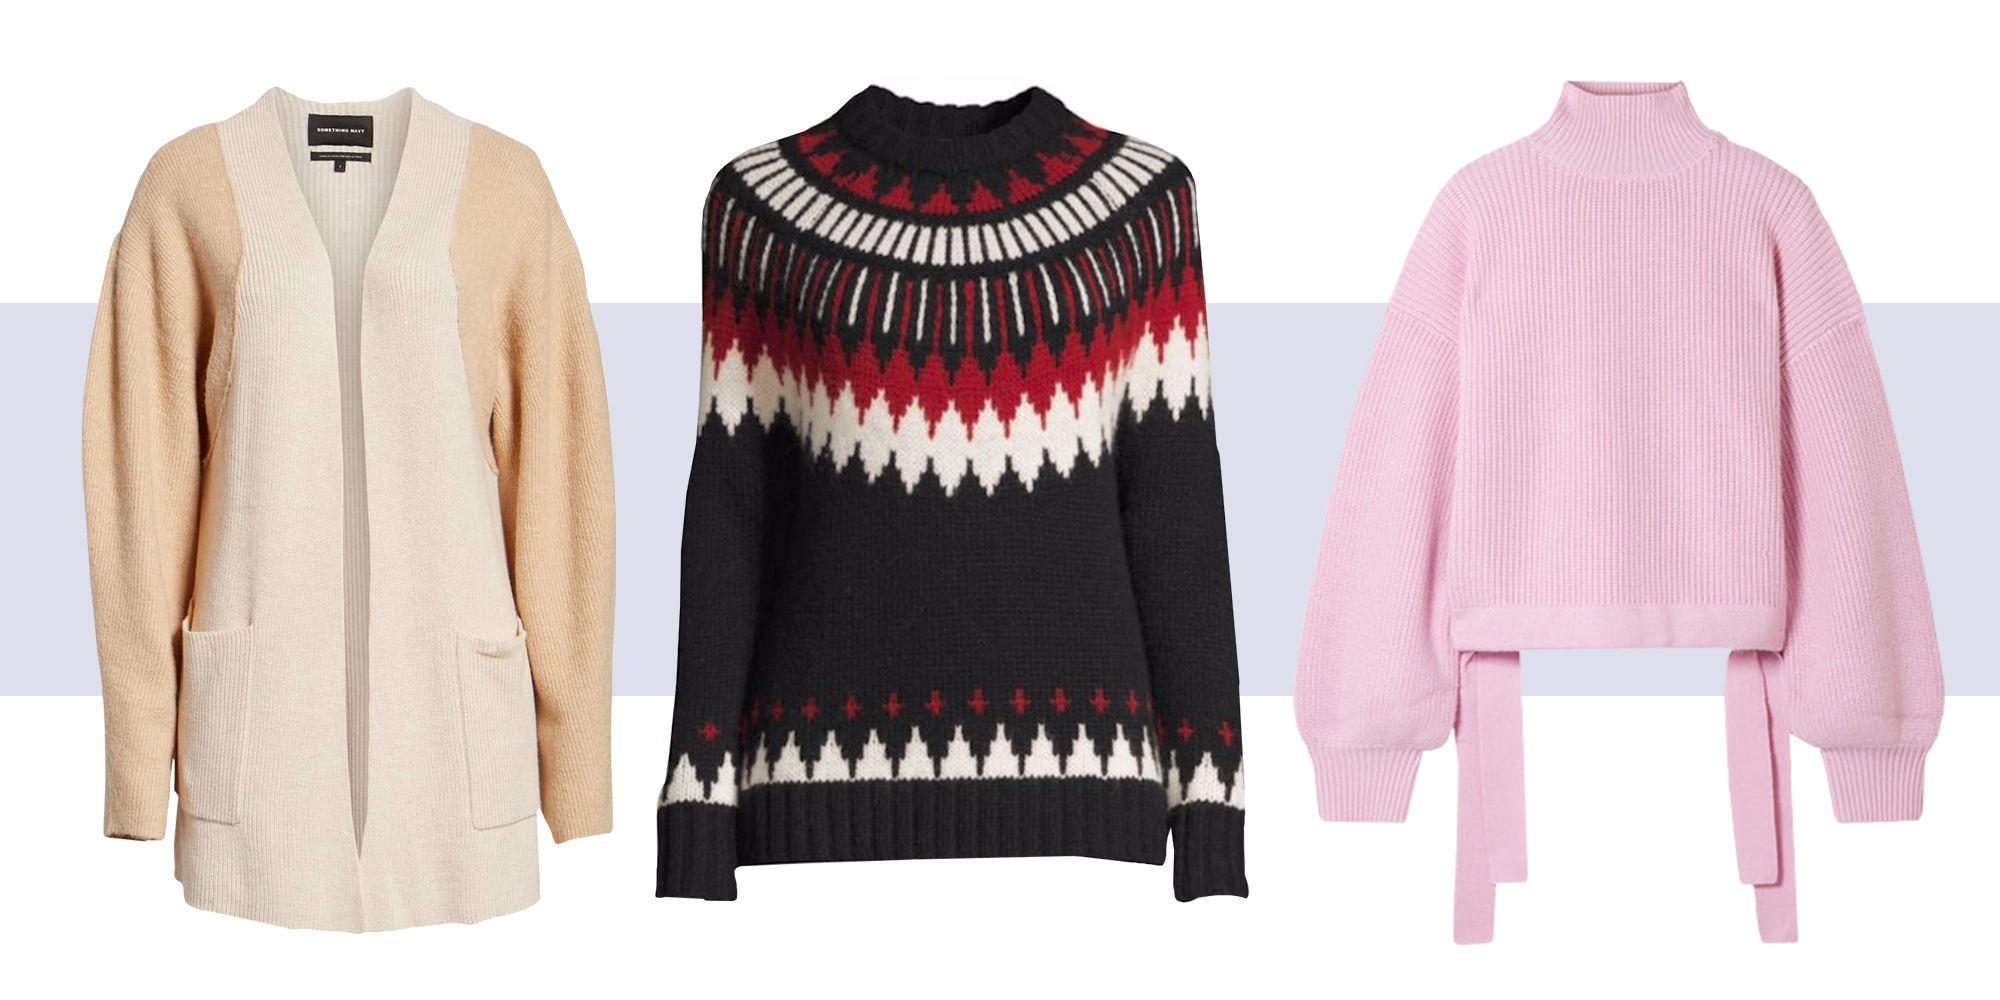 b22deccbfd3 20 Best Winter Sweaters for 2018 - Cute Winter Sweaters for Women